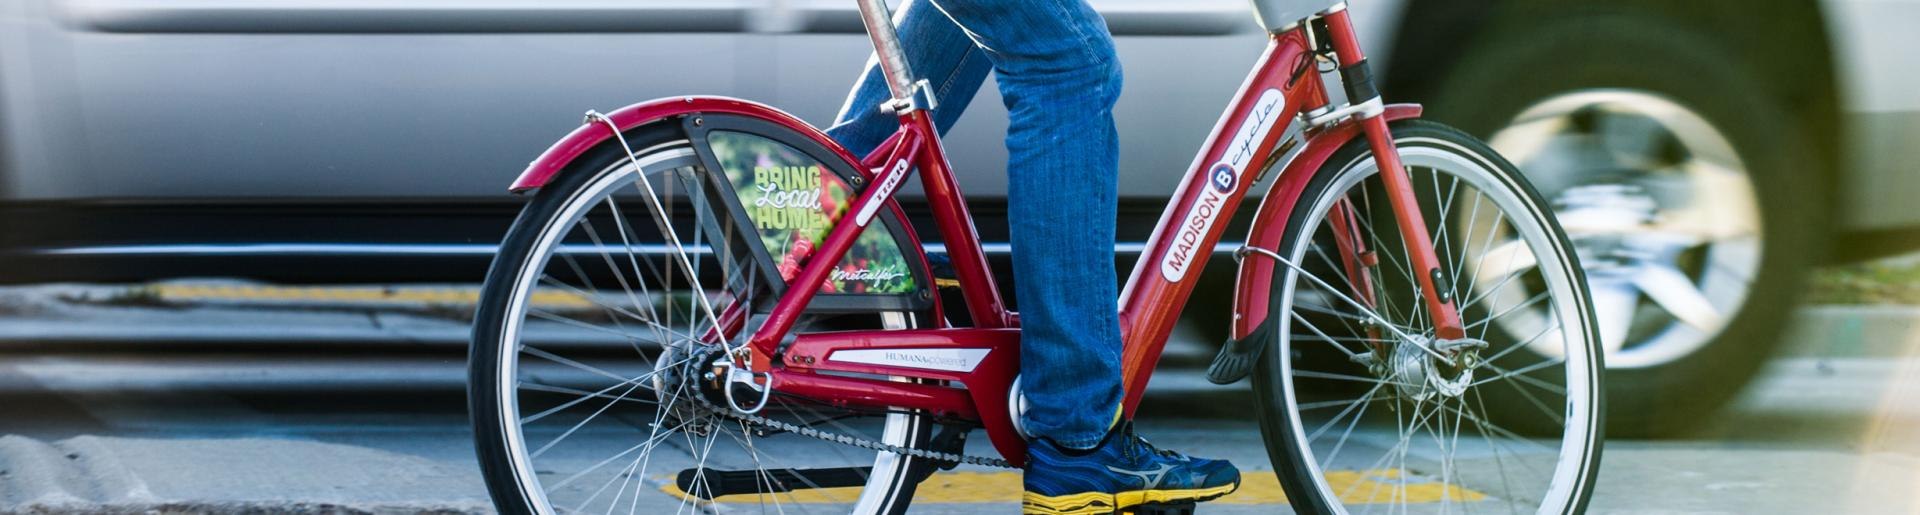 BCycle Red Bike